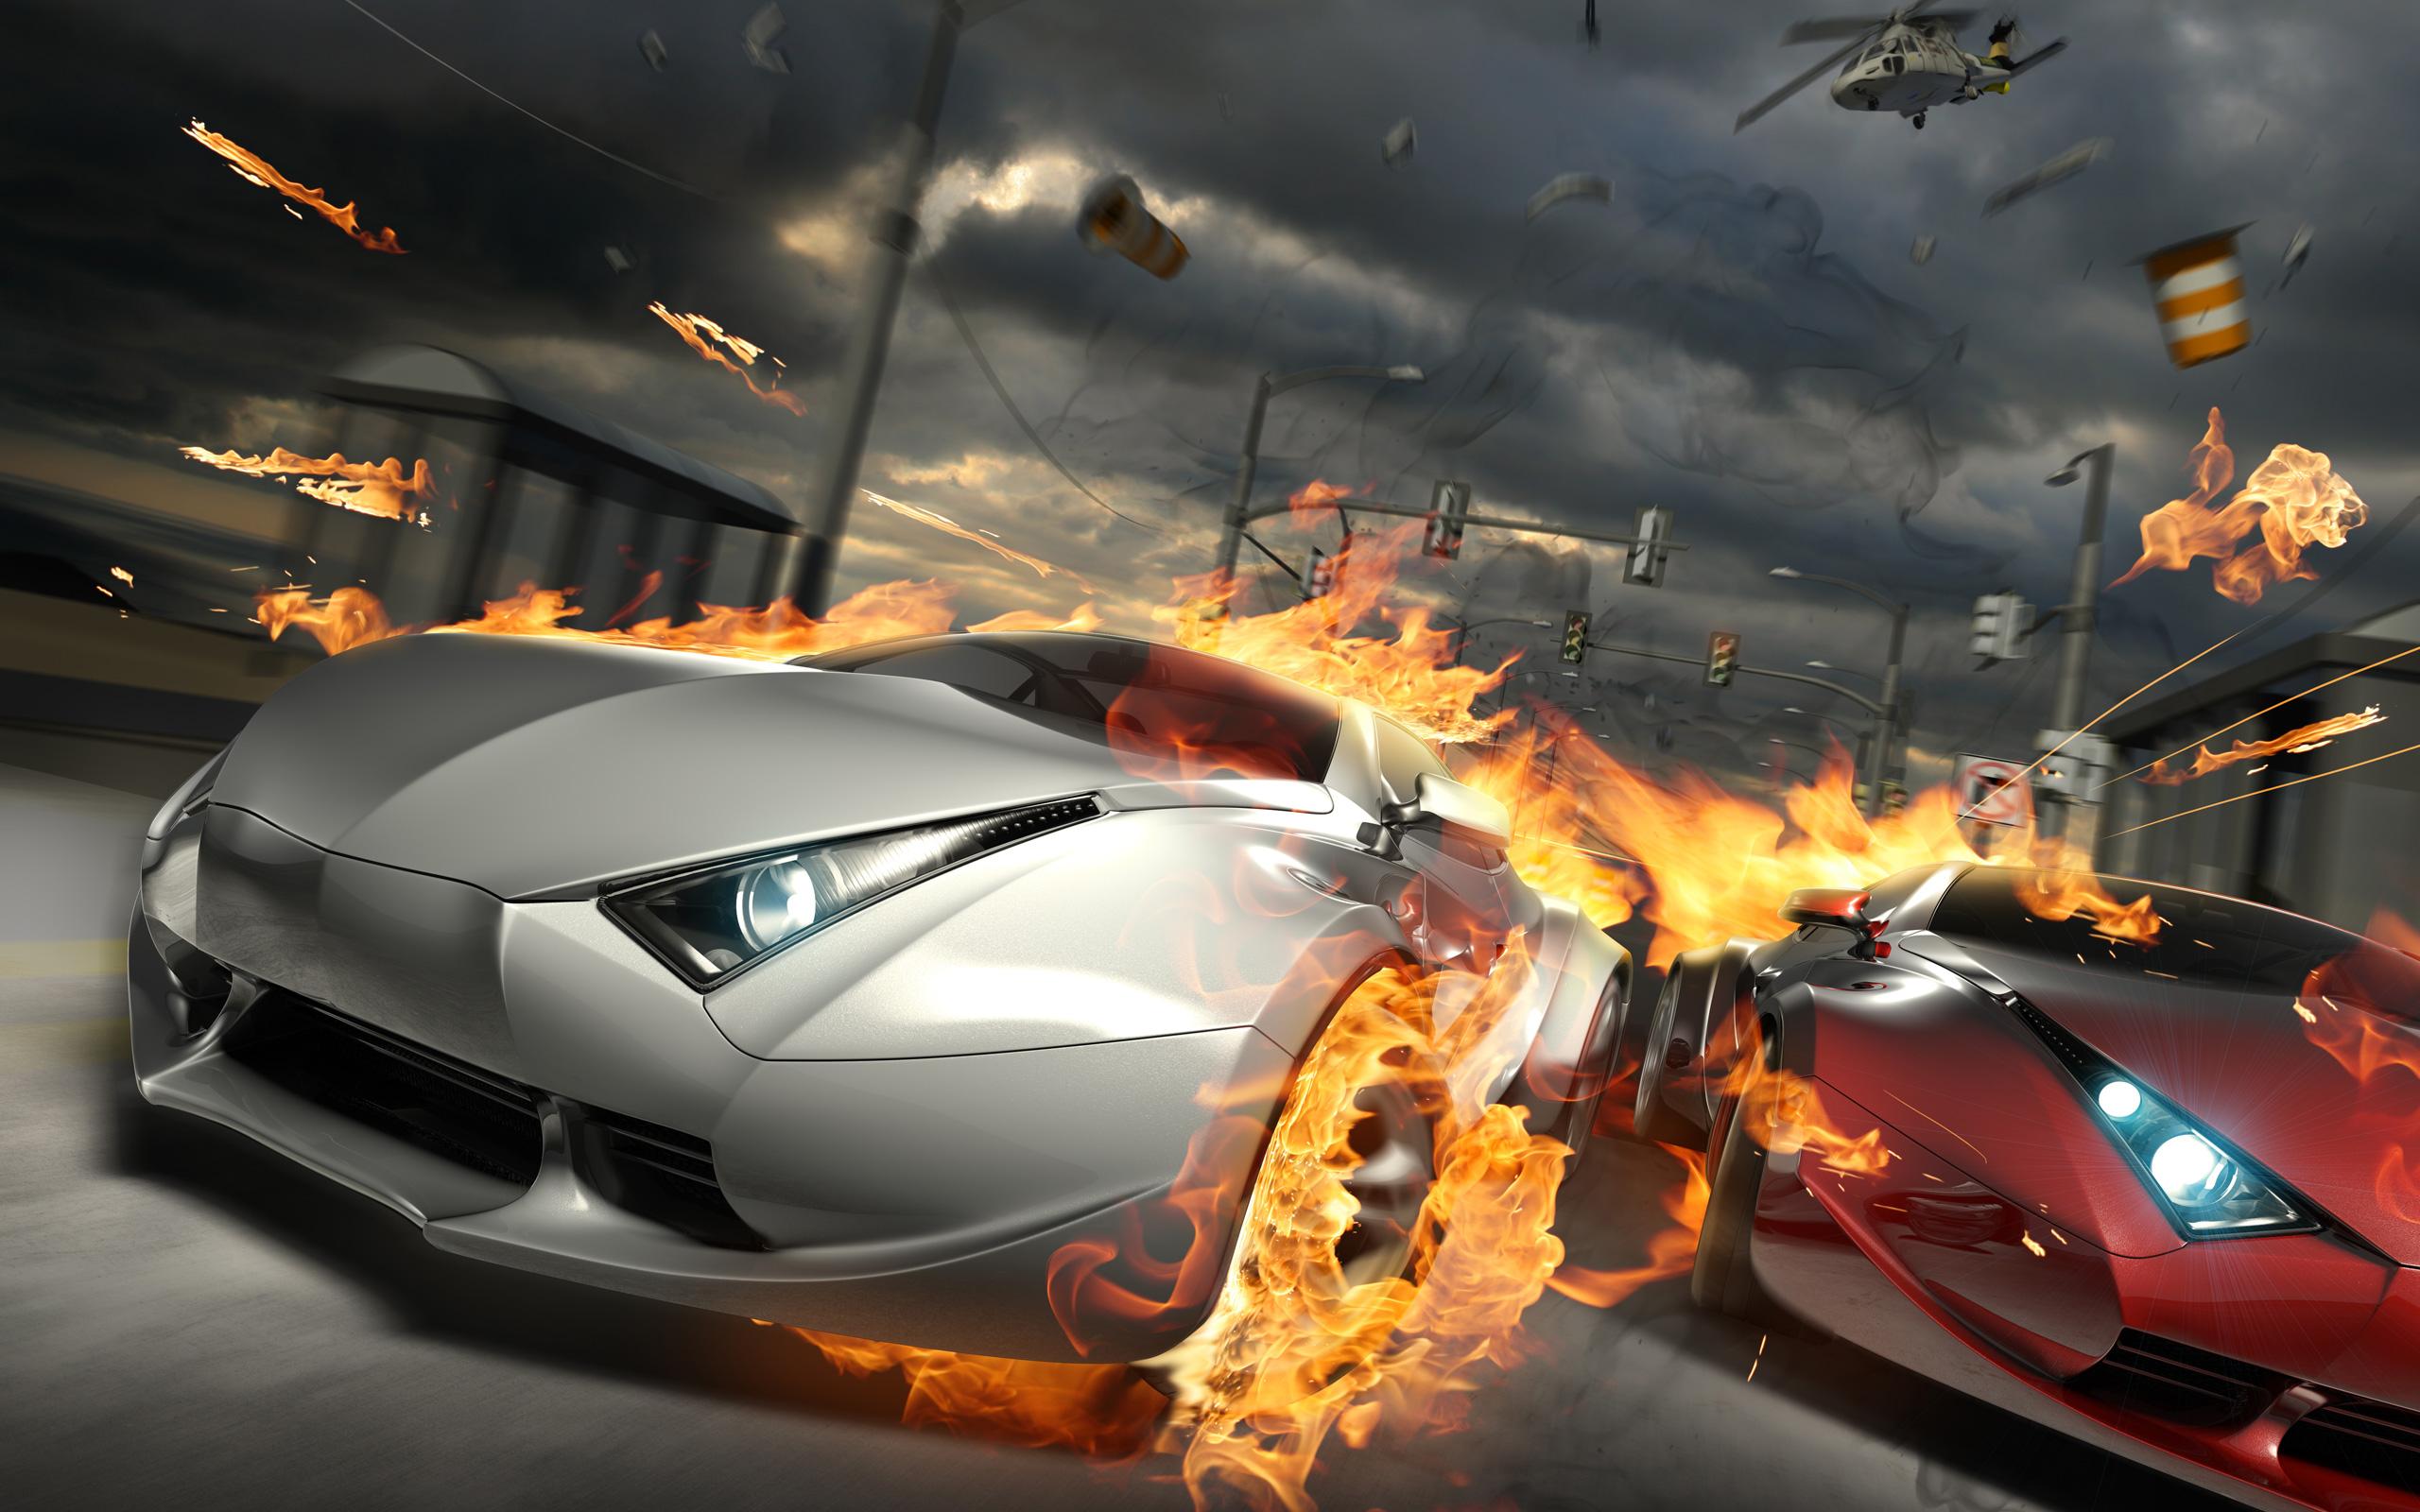 Destructive Car Race Wallpapers HD Wallpapers 2560x1600